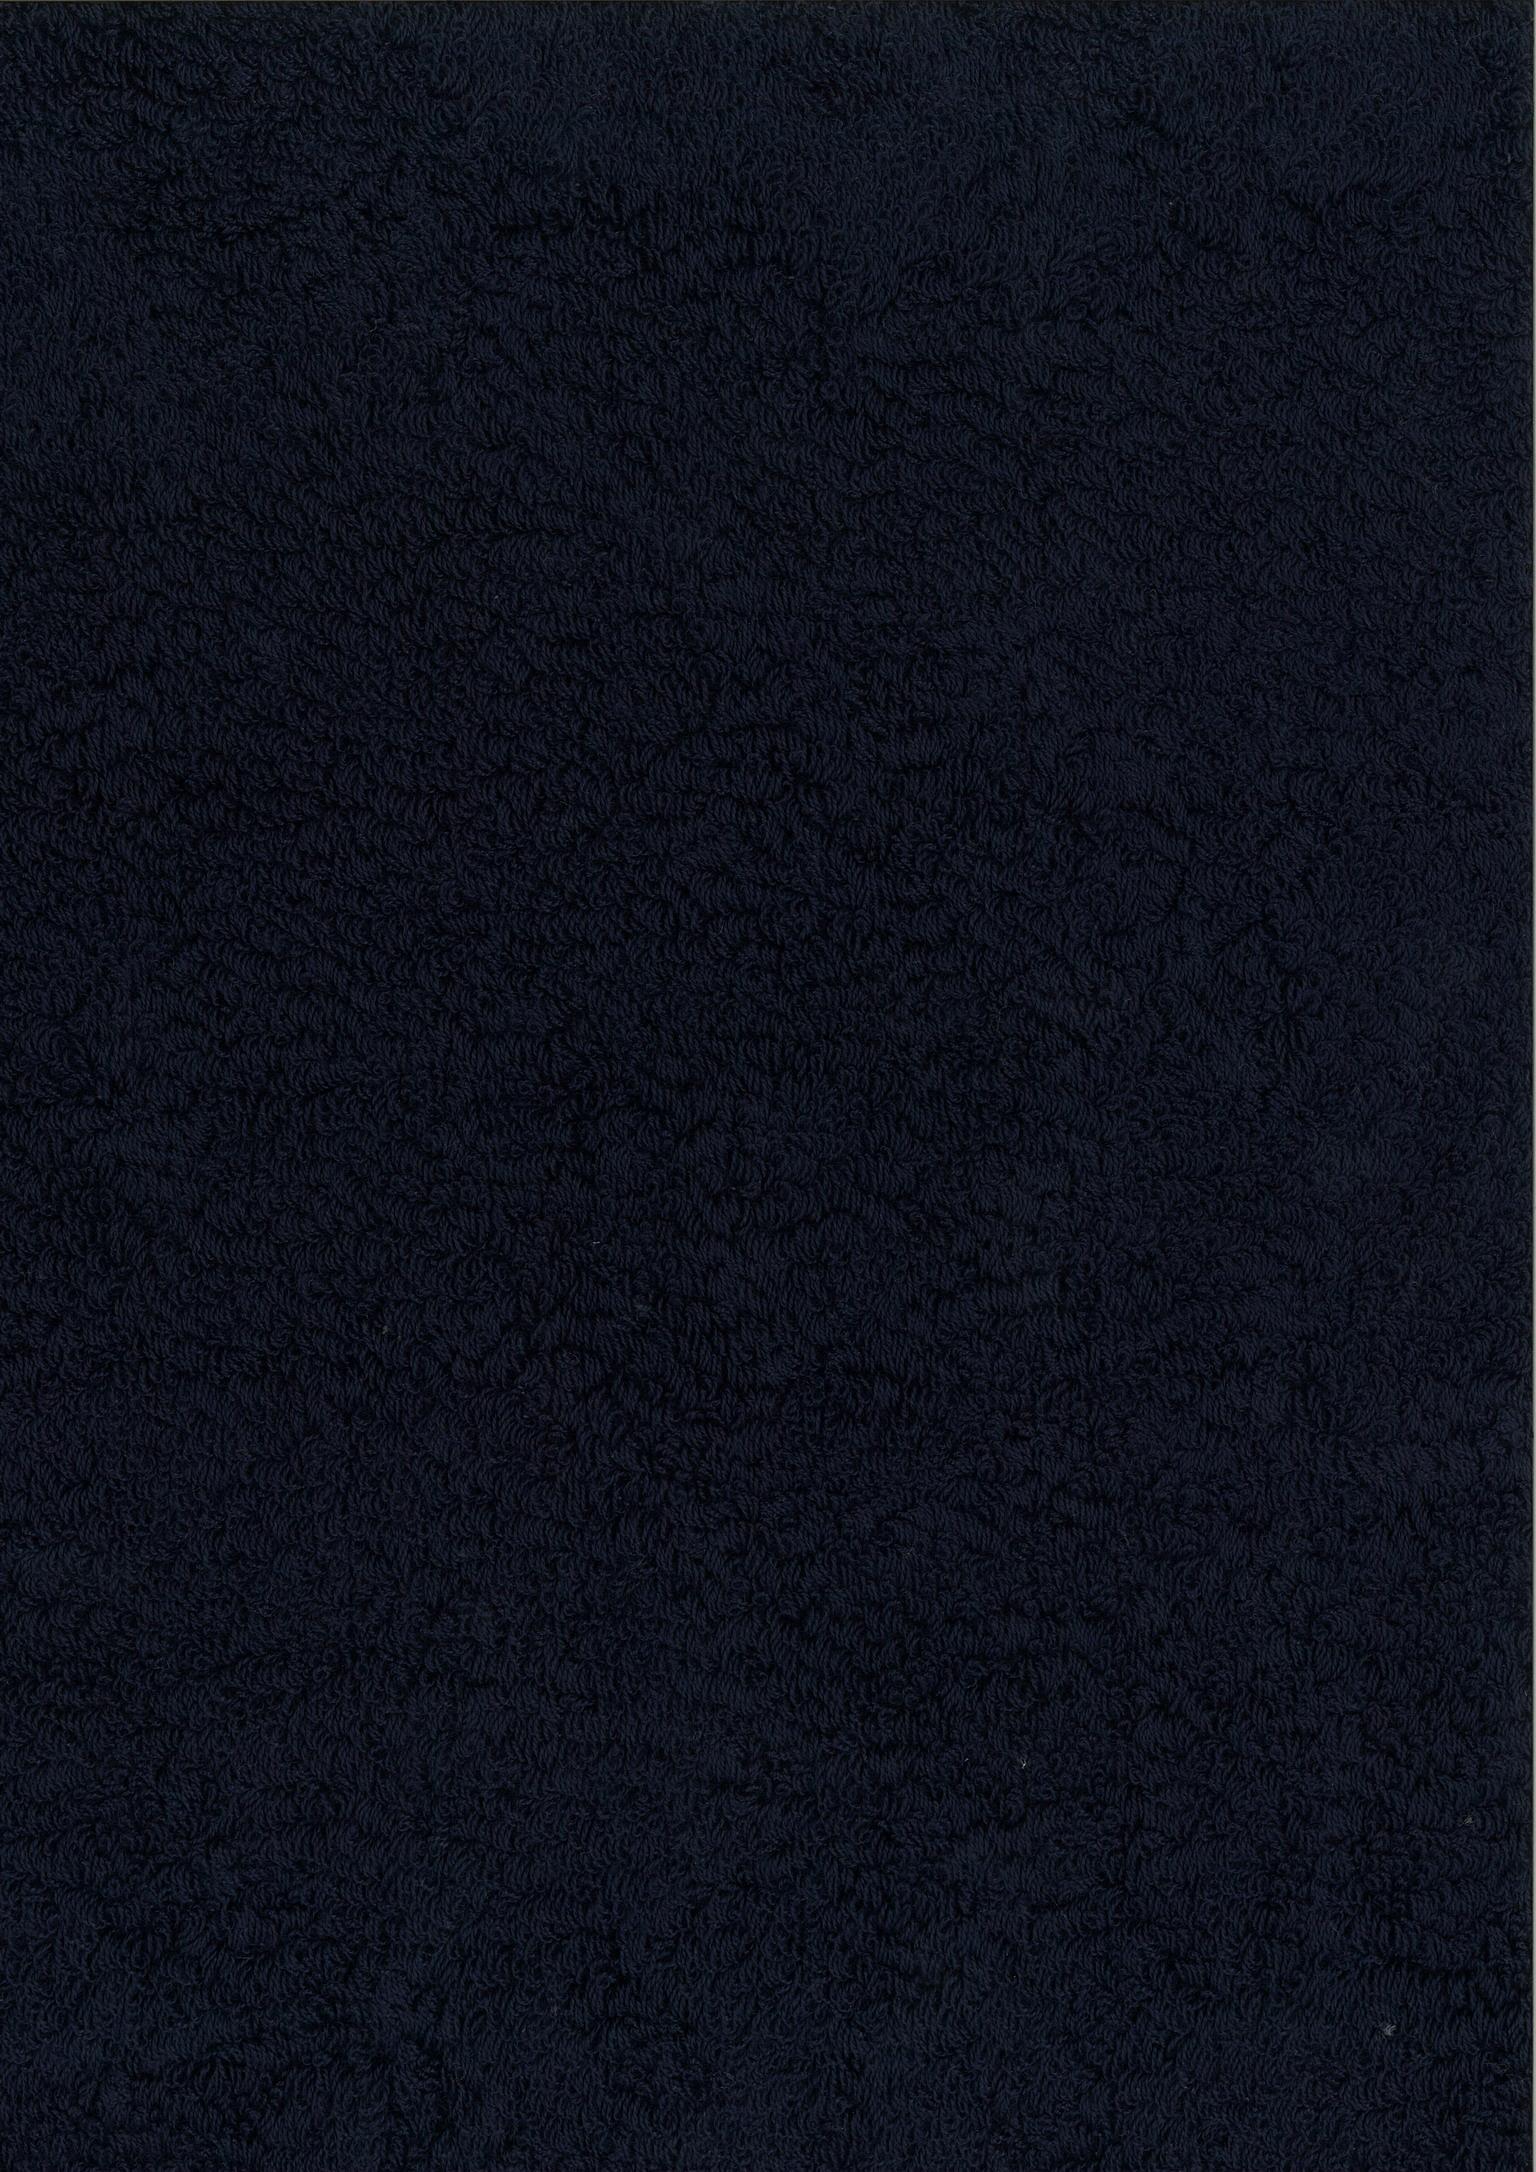 FLORIDA Ultramarine